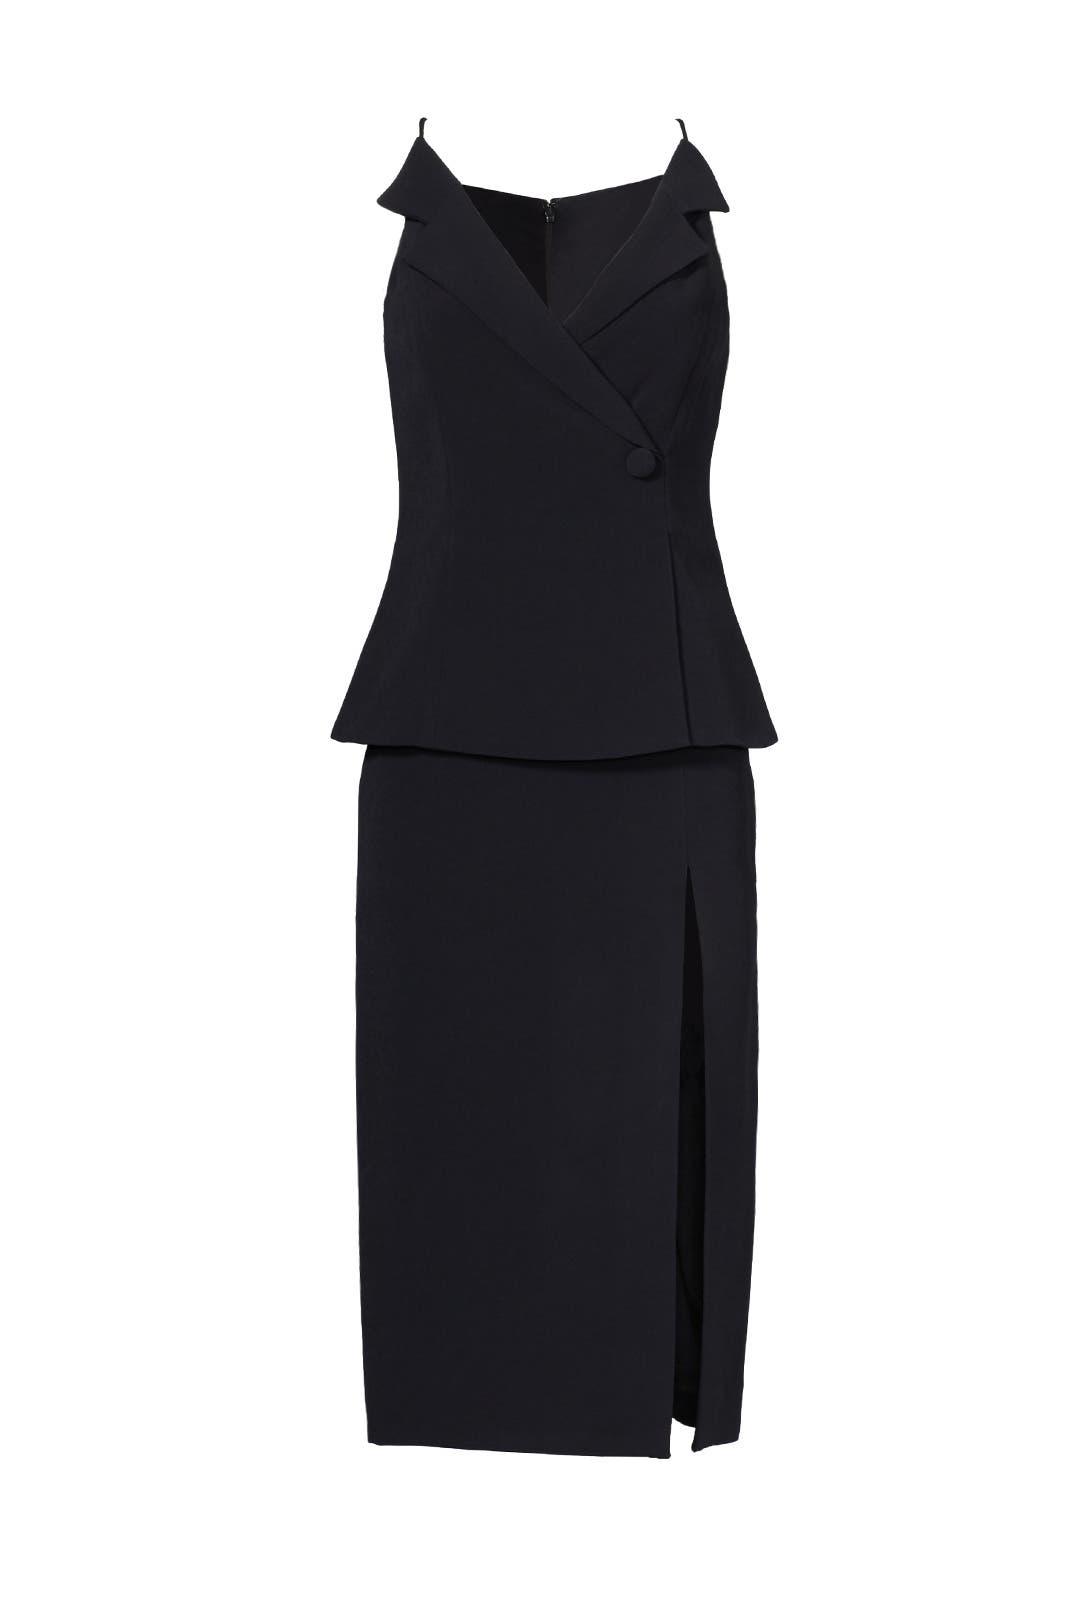 537abca8c00 Cushnie Ani Dress